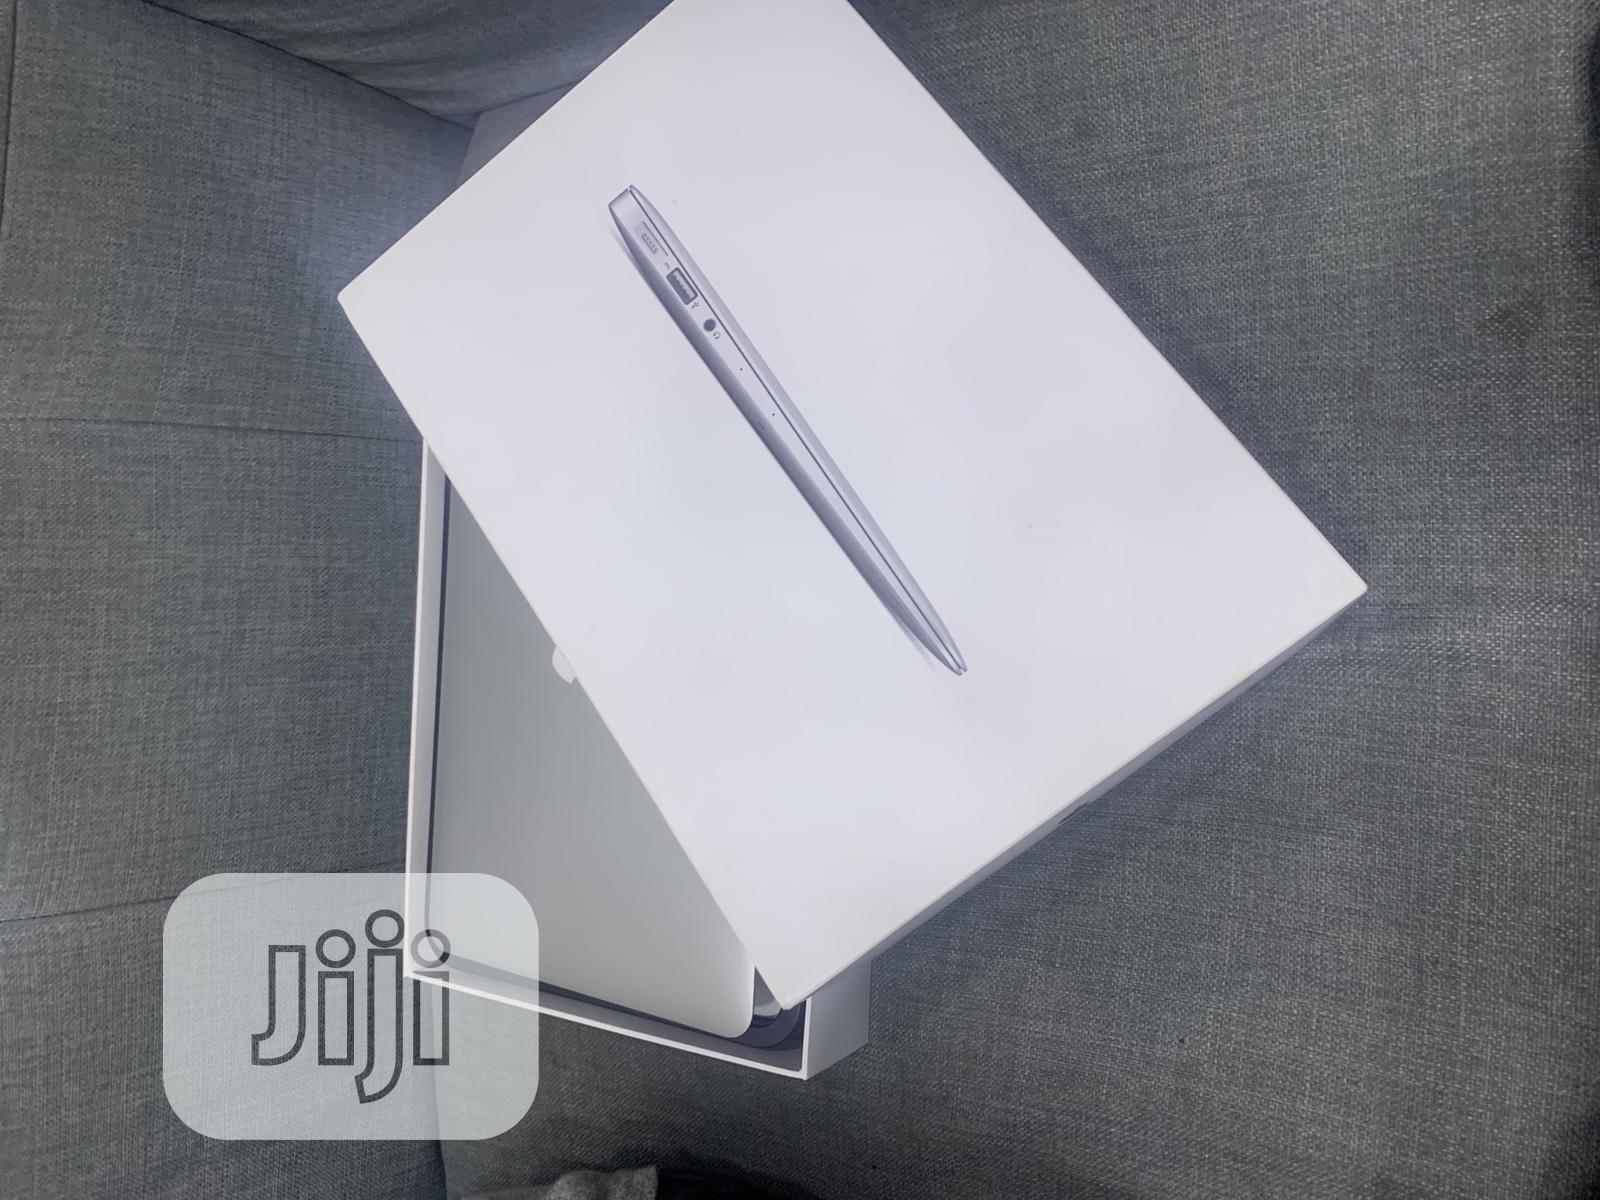 Laptop Apple MacBook Air 2015 4GB Intel Core i5 SSD 128GB | Laptops & Computers for sale in Ikeja, Lagos State, Nigeria